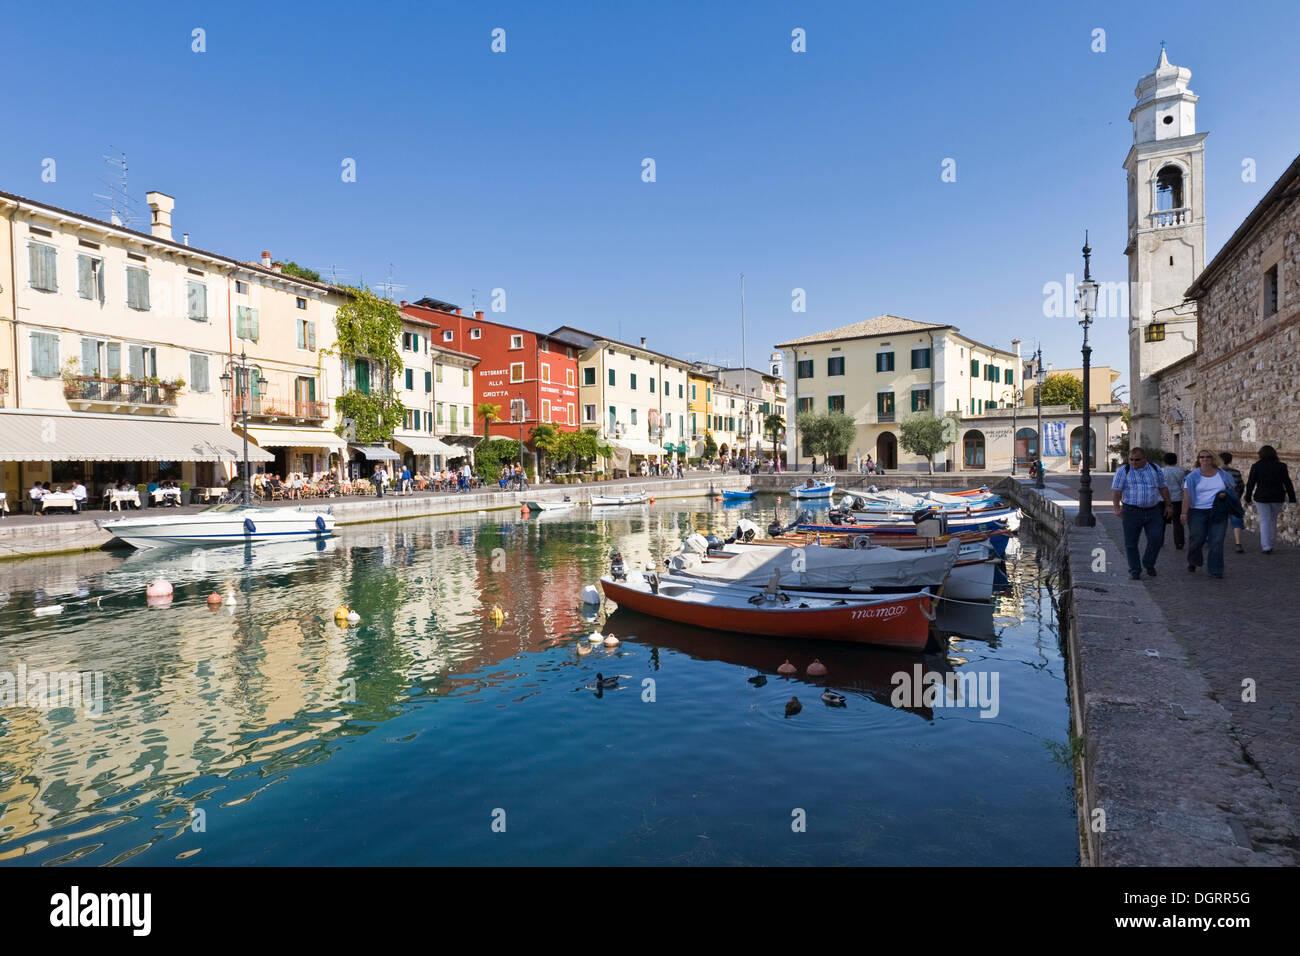 Boats anchored in the harbour along Via Fontana street, Lazise, Lago di Garda, Lake Garda, Lombardy, Italy, Europe - Stock Image